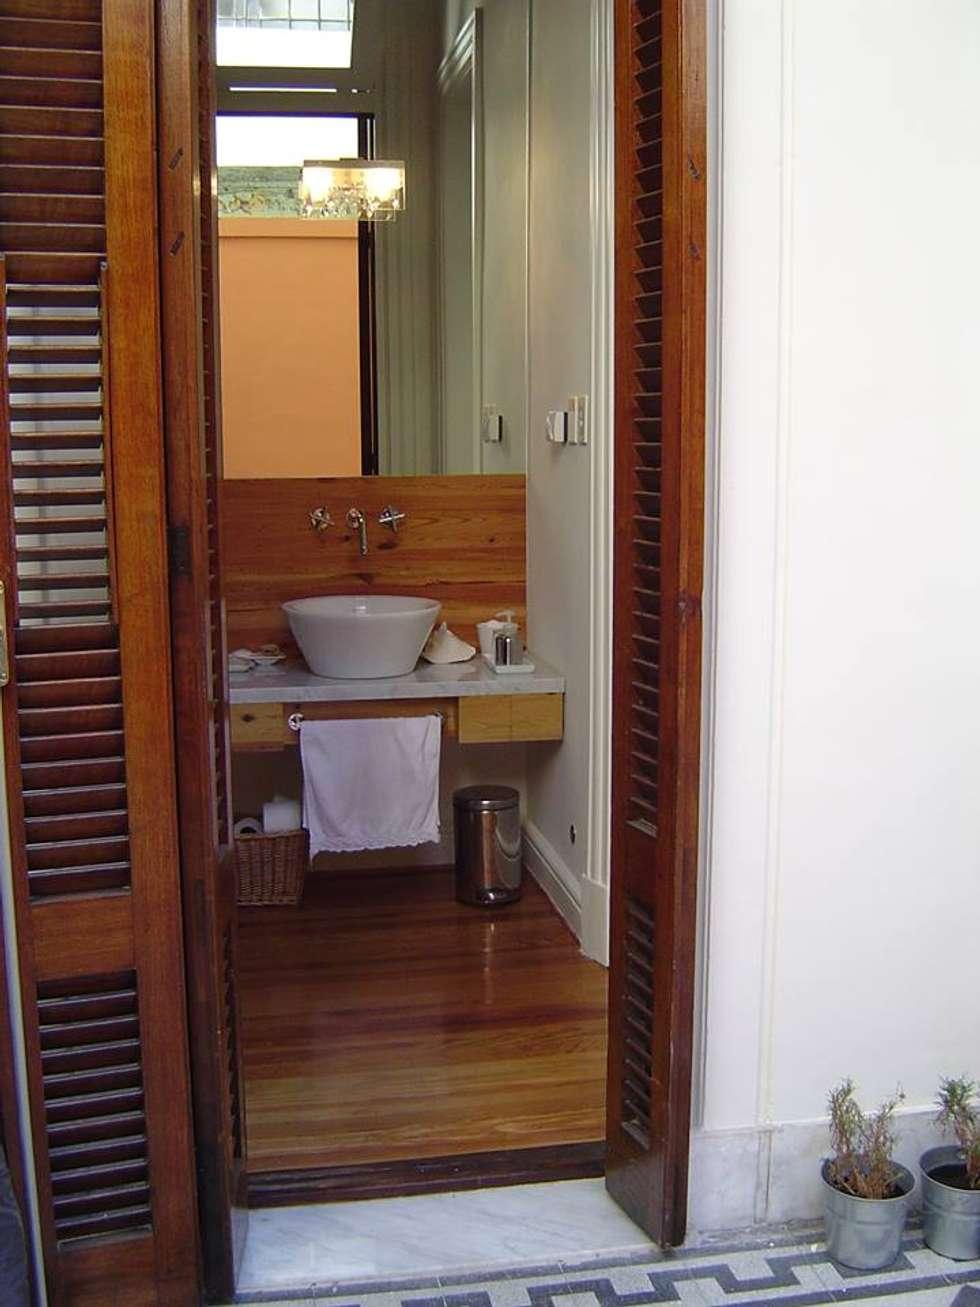 Antebaño : Baños de estilo moderno por arq.c2